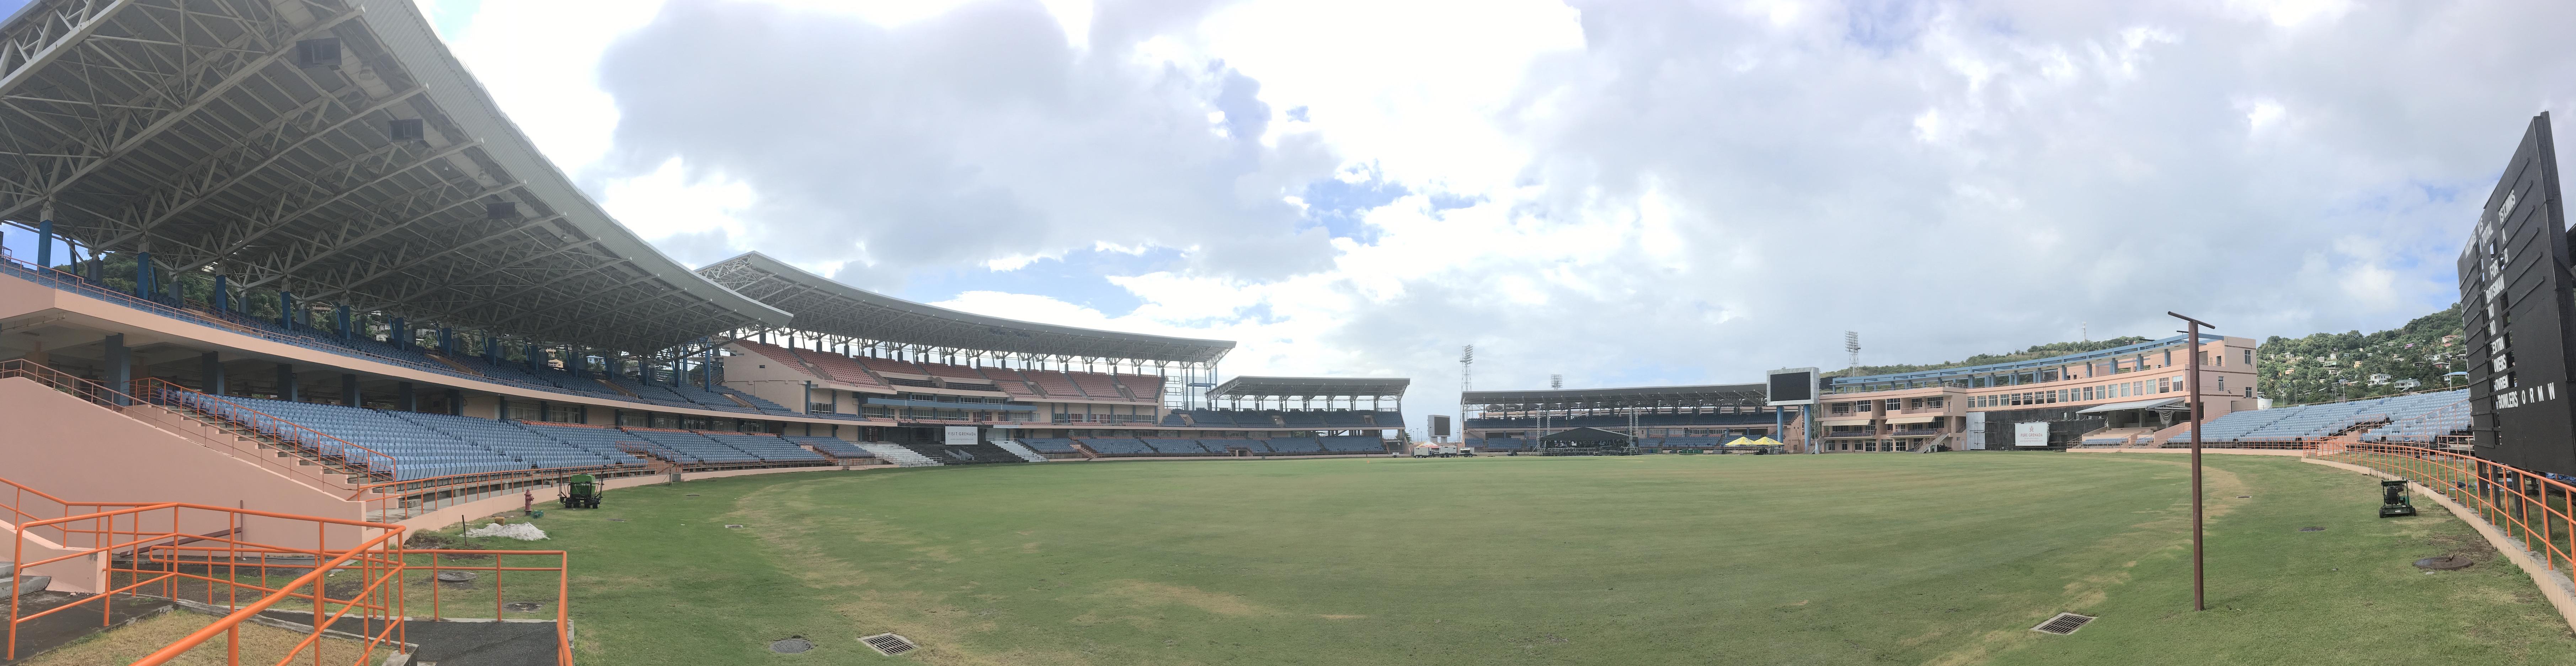 National Cricket Stadium